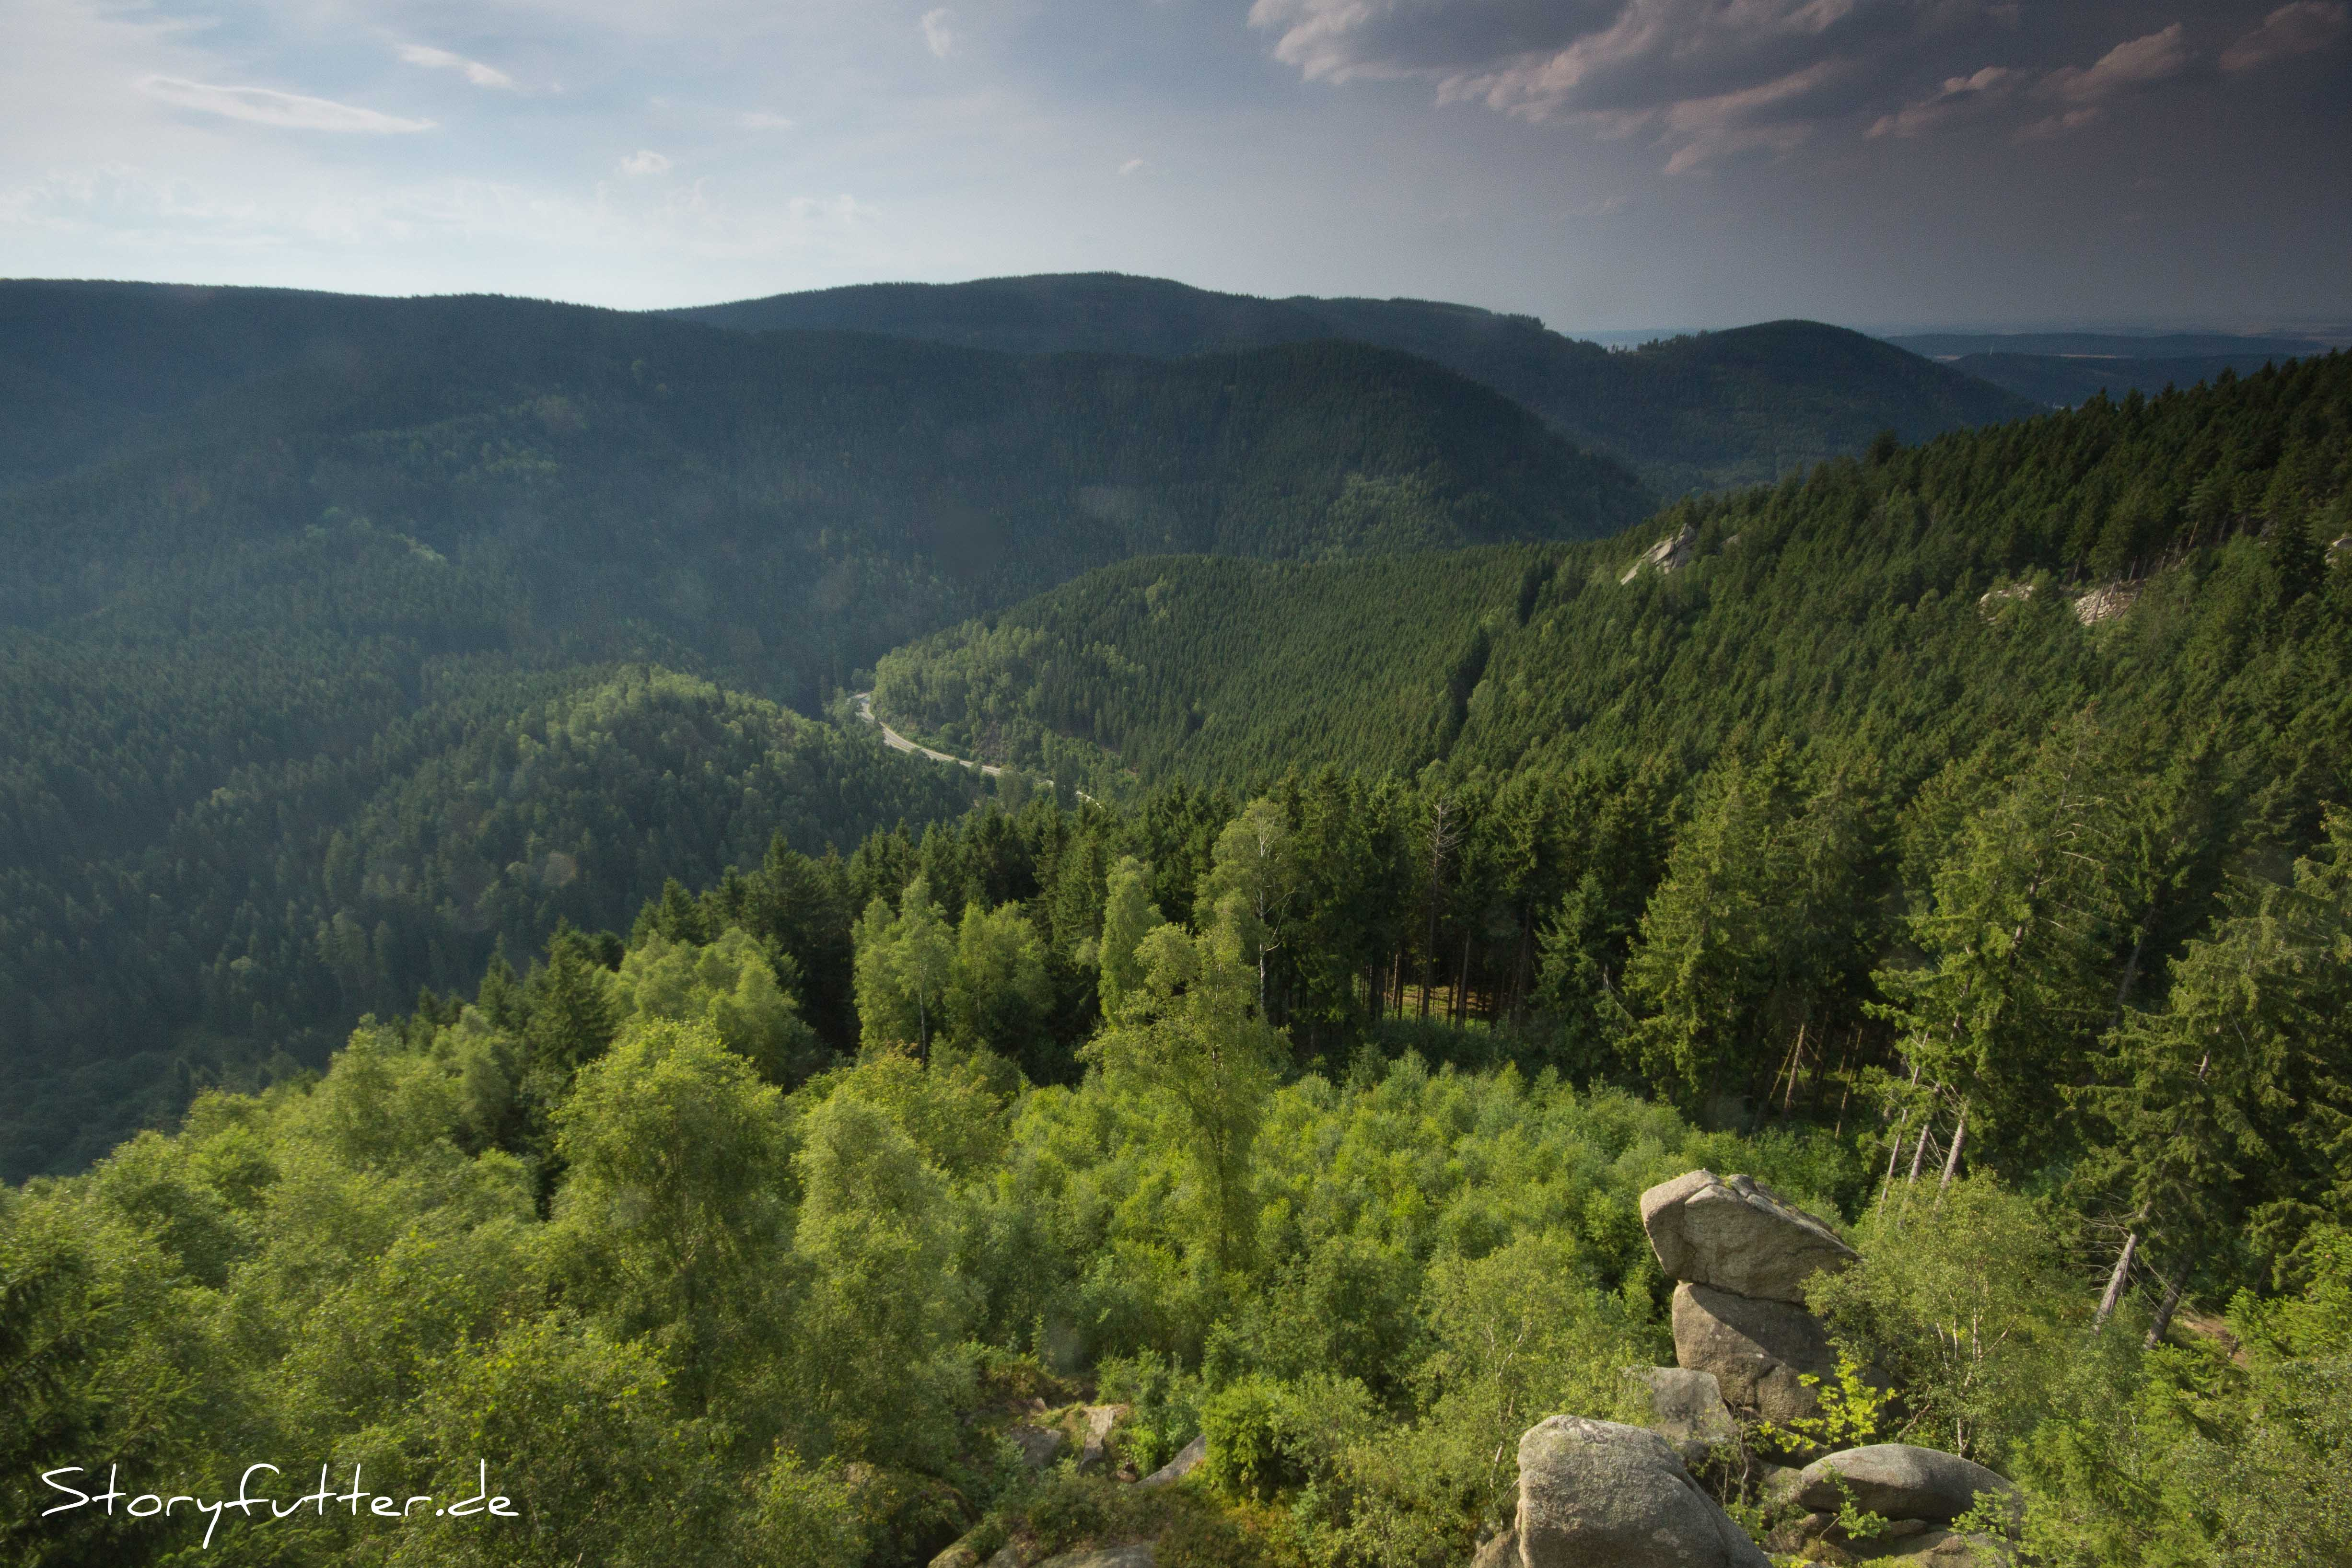 Aussichtsklippen Harz Backpacking Kästeklippen Okertal